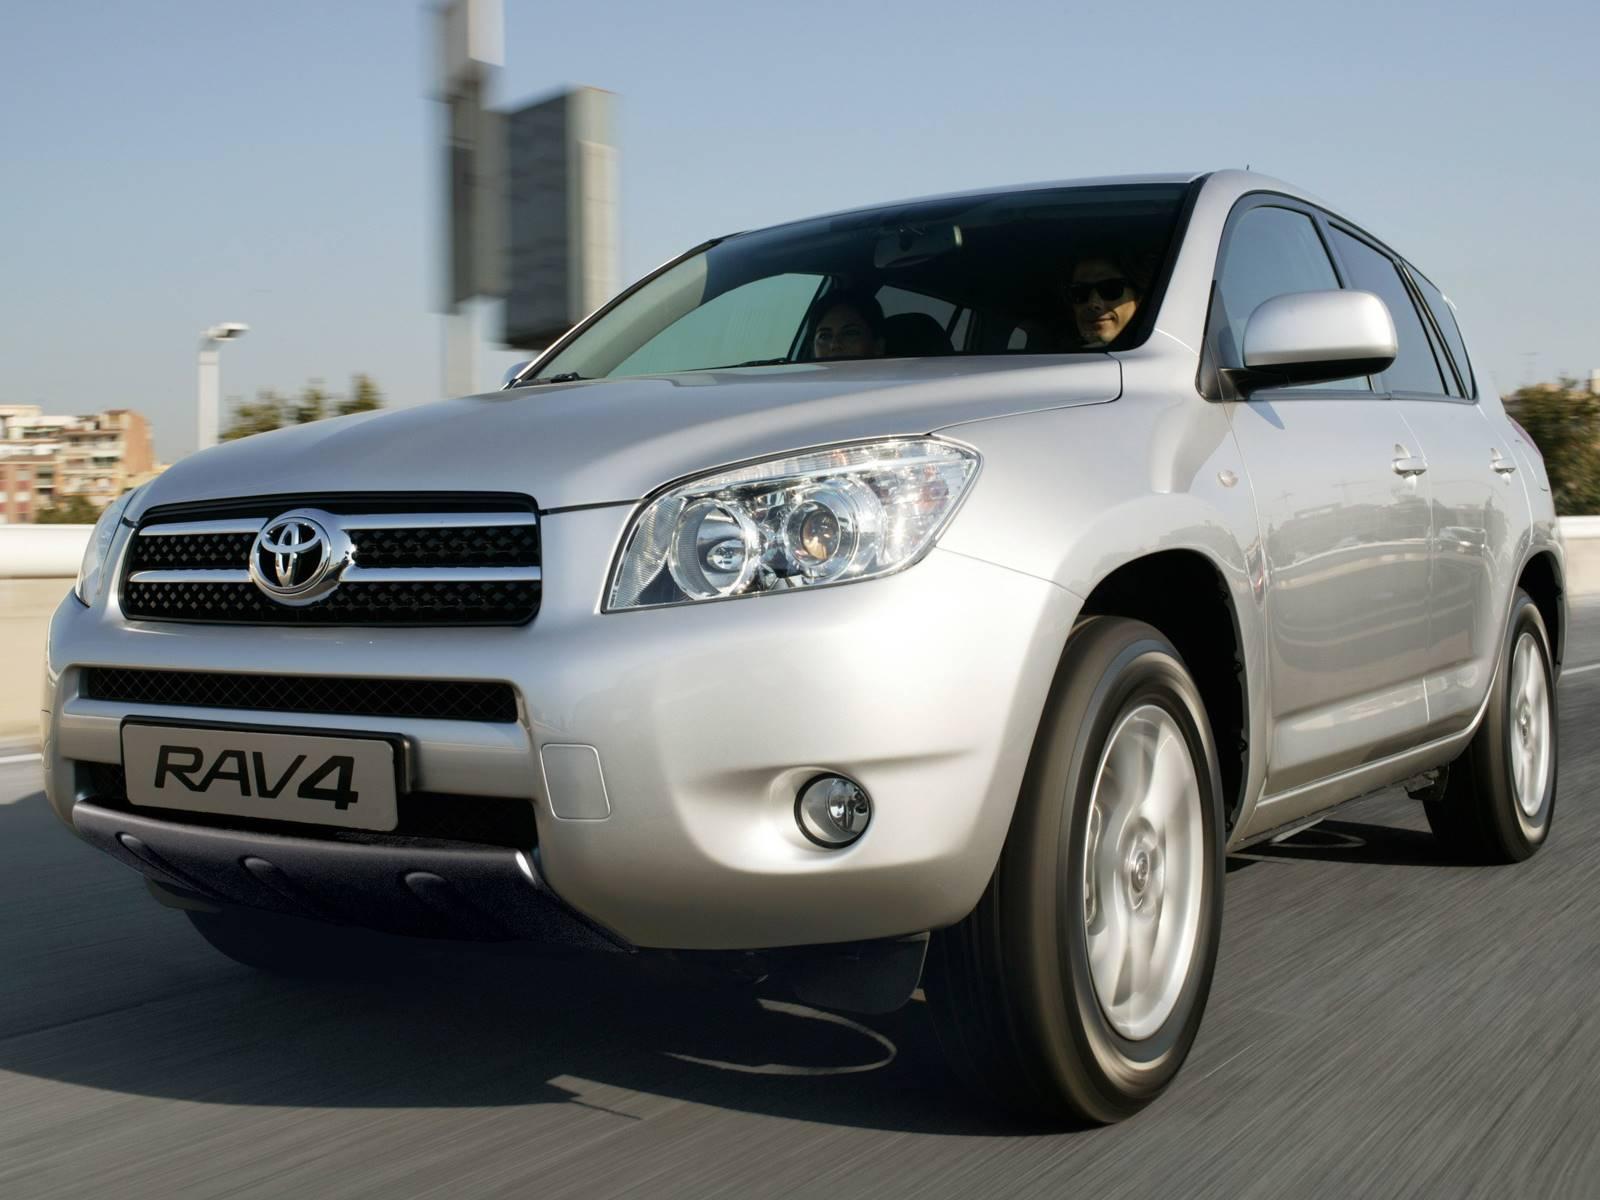 Toyota RAV4 2006 A 2011   Recall